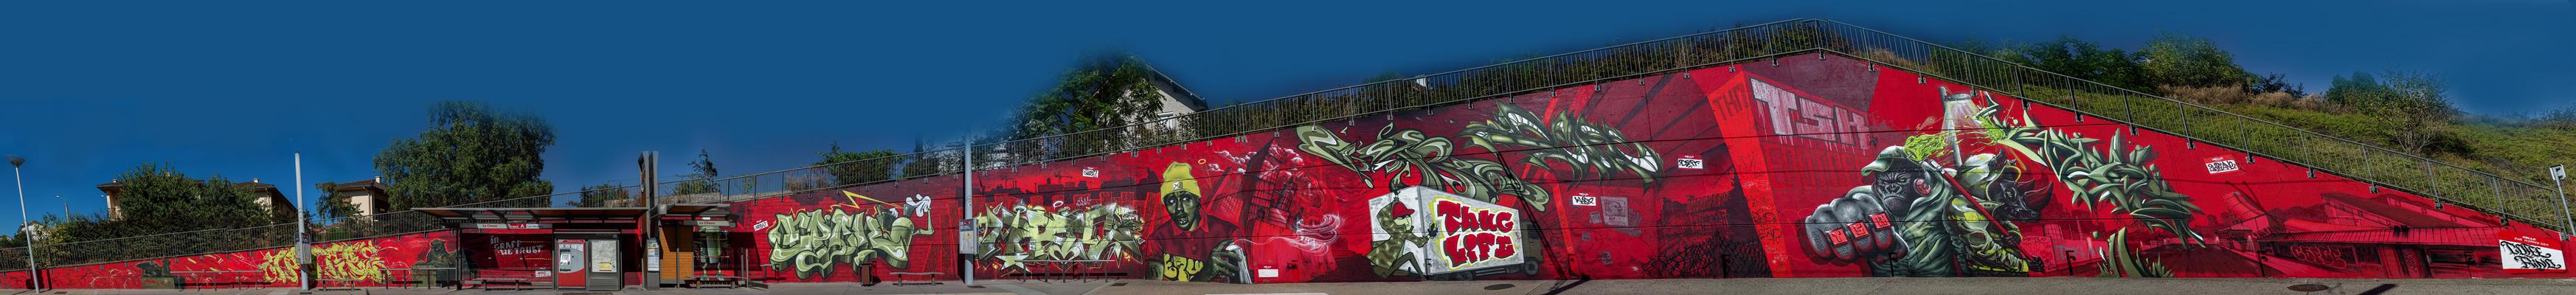 Cofee, Waro, Rino, Epok, Marthe, Repi, Kaer, Apogé et Deft - Graffiti - Clermont-Ferrand